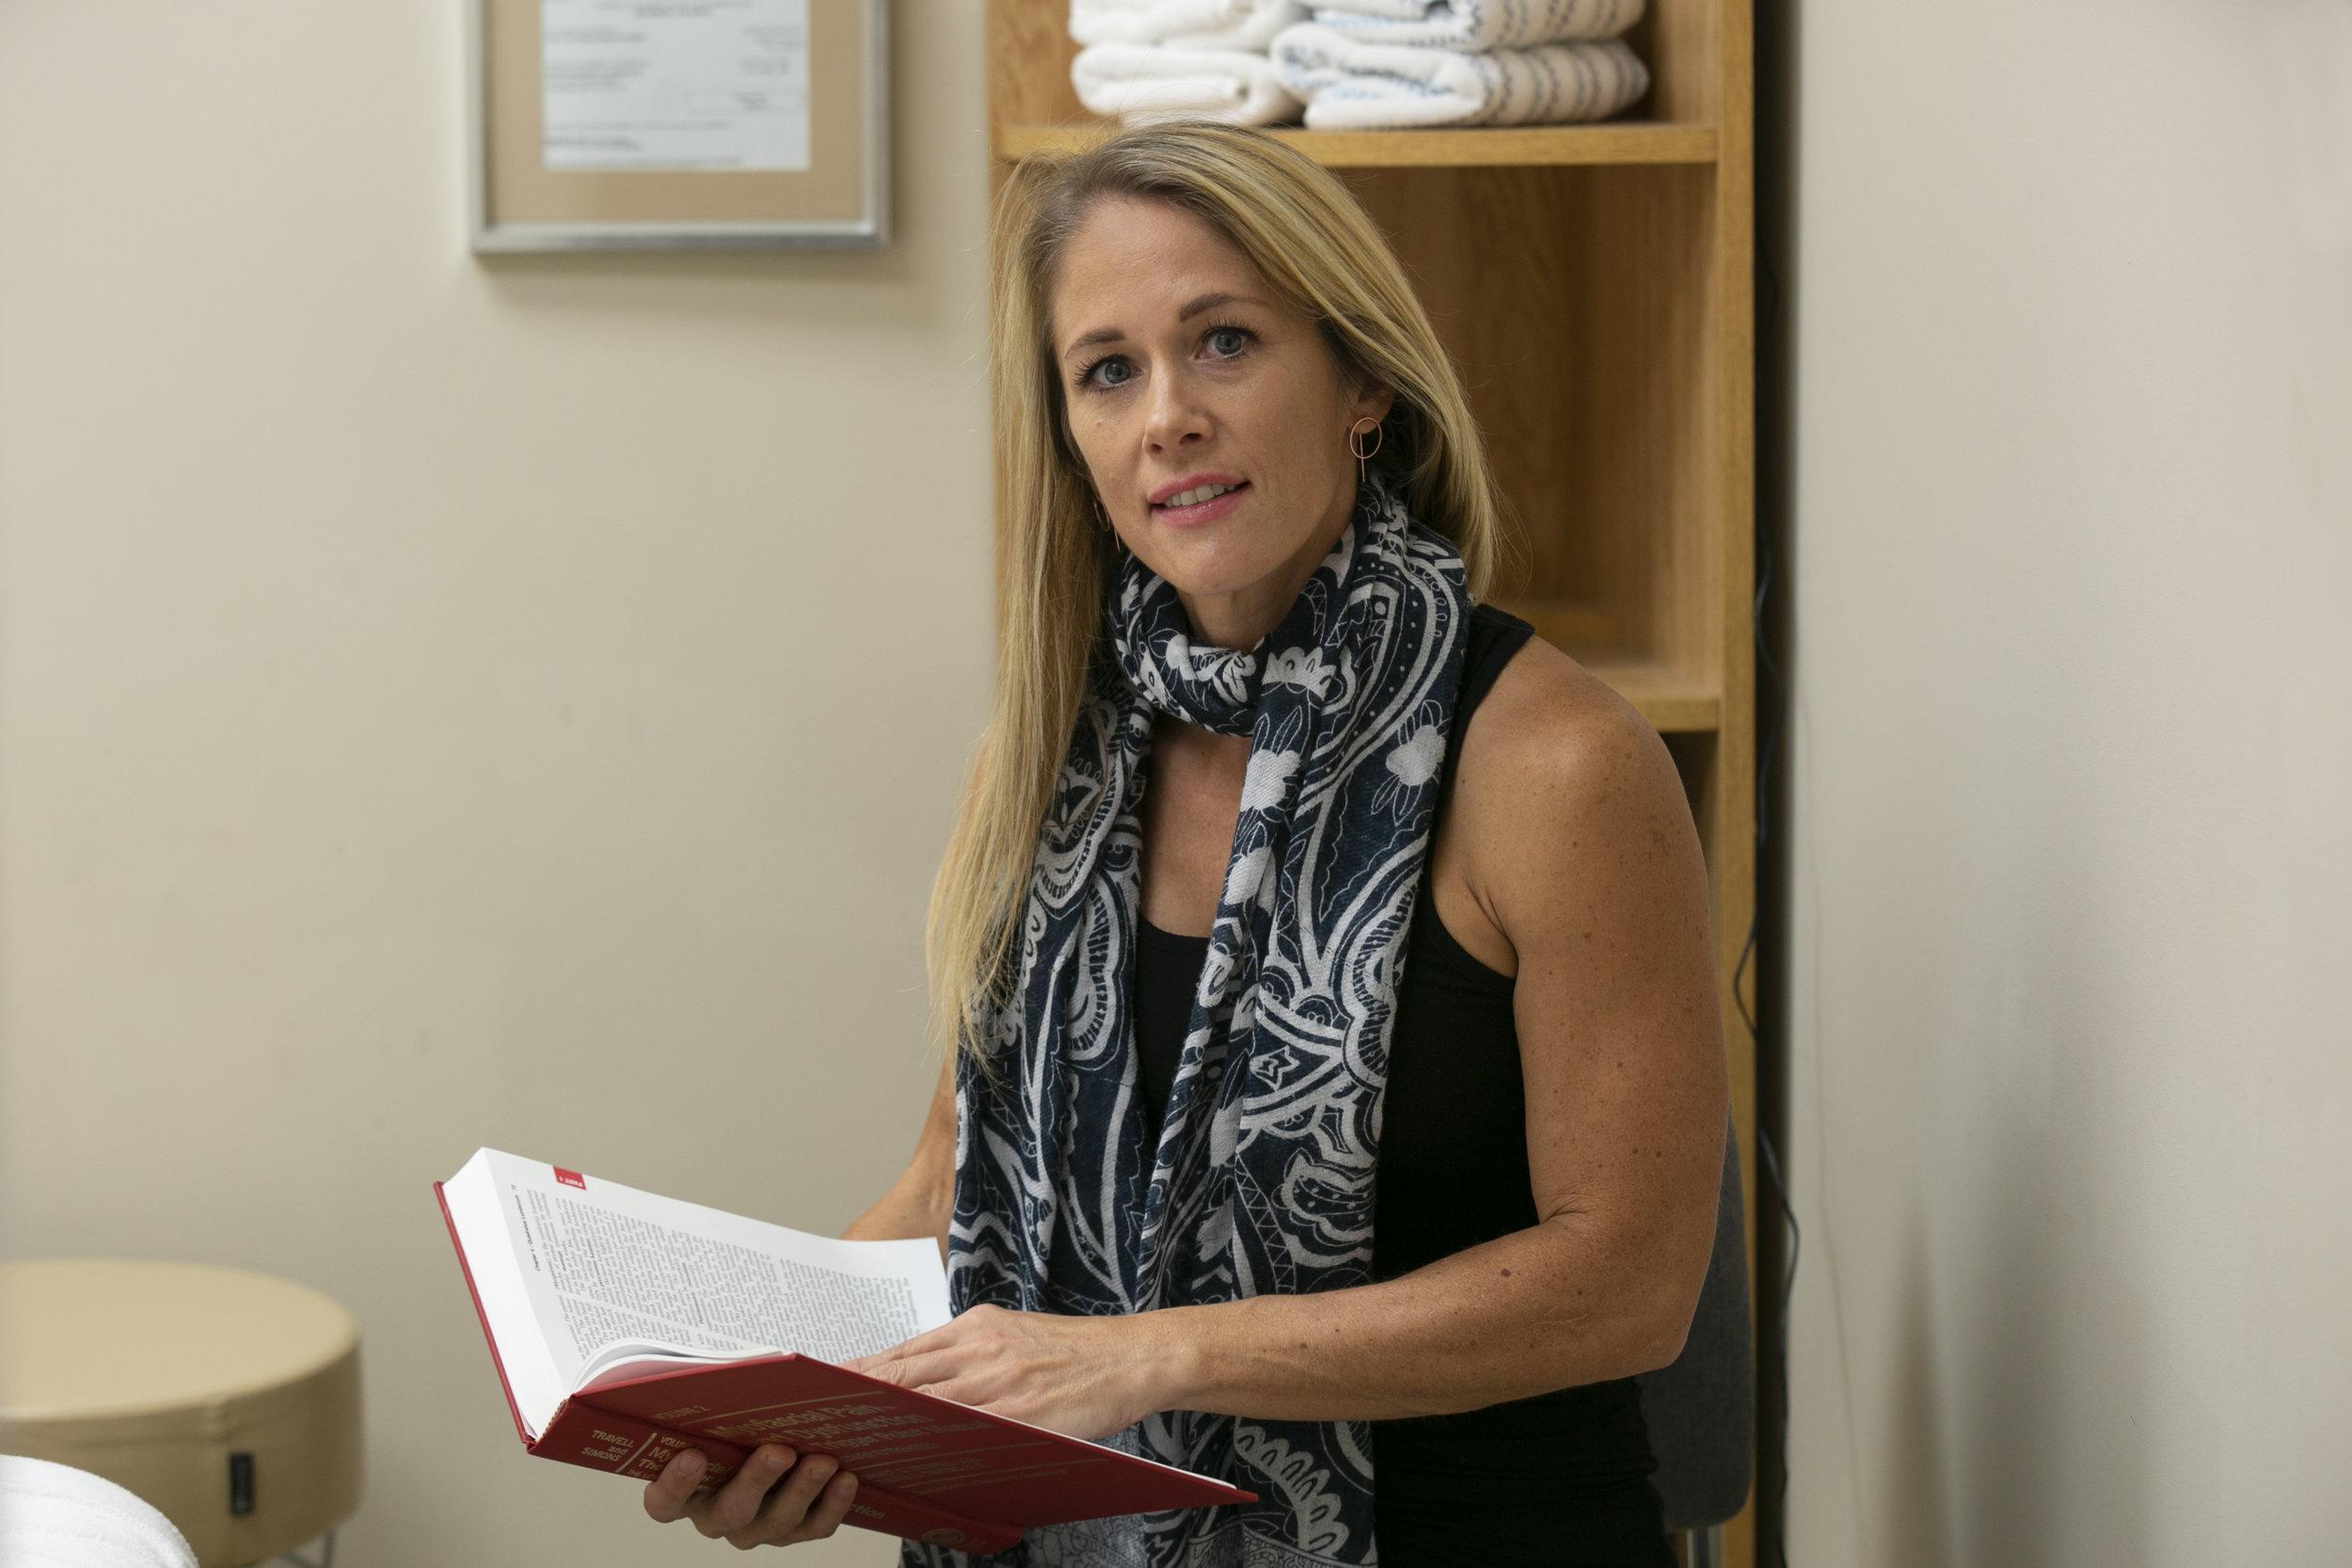 Carrie Allen -RN/ Medical Cannabis Consultant